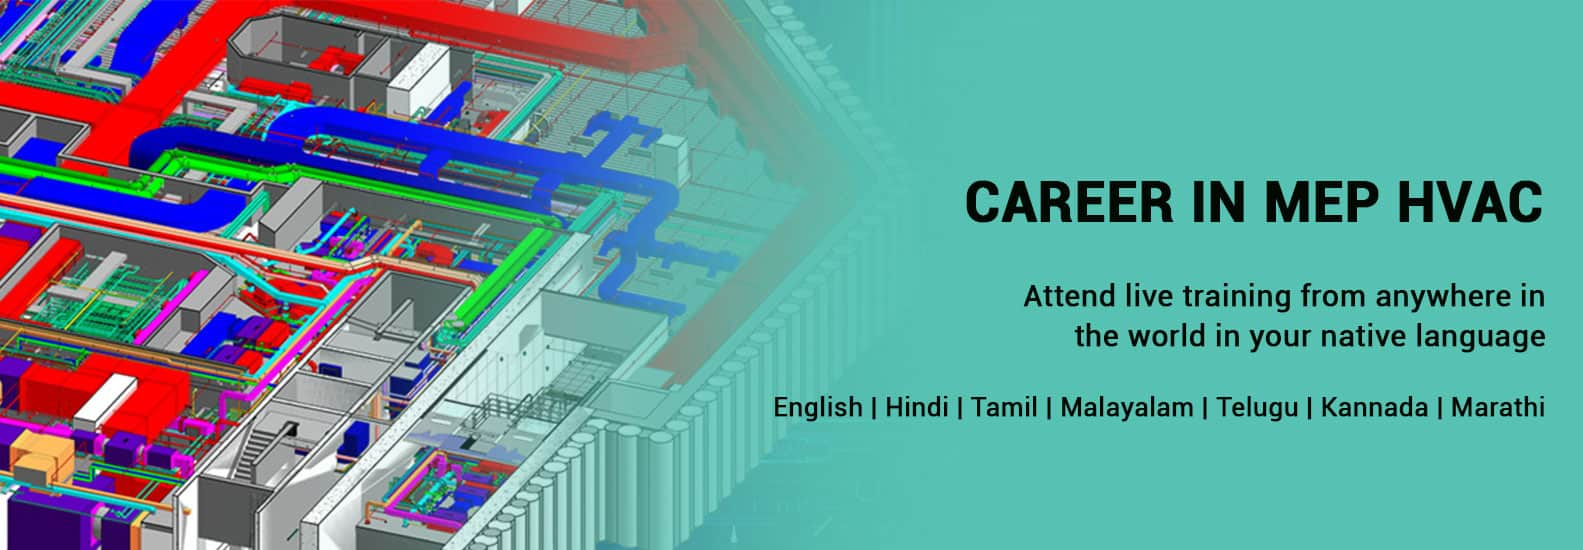 MEP HVAC Training in Adilabad Telangana|MEP HVAC Course in Adilabad Telangana|SMEClabs